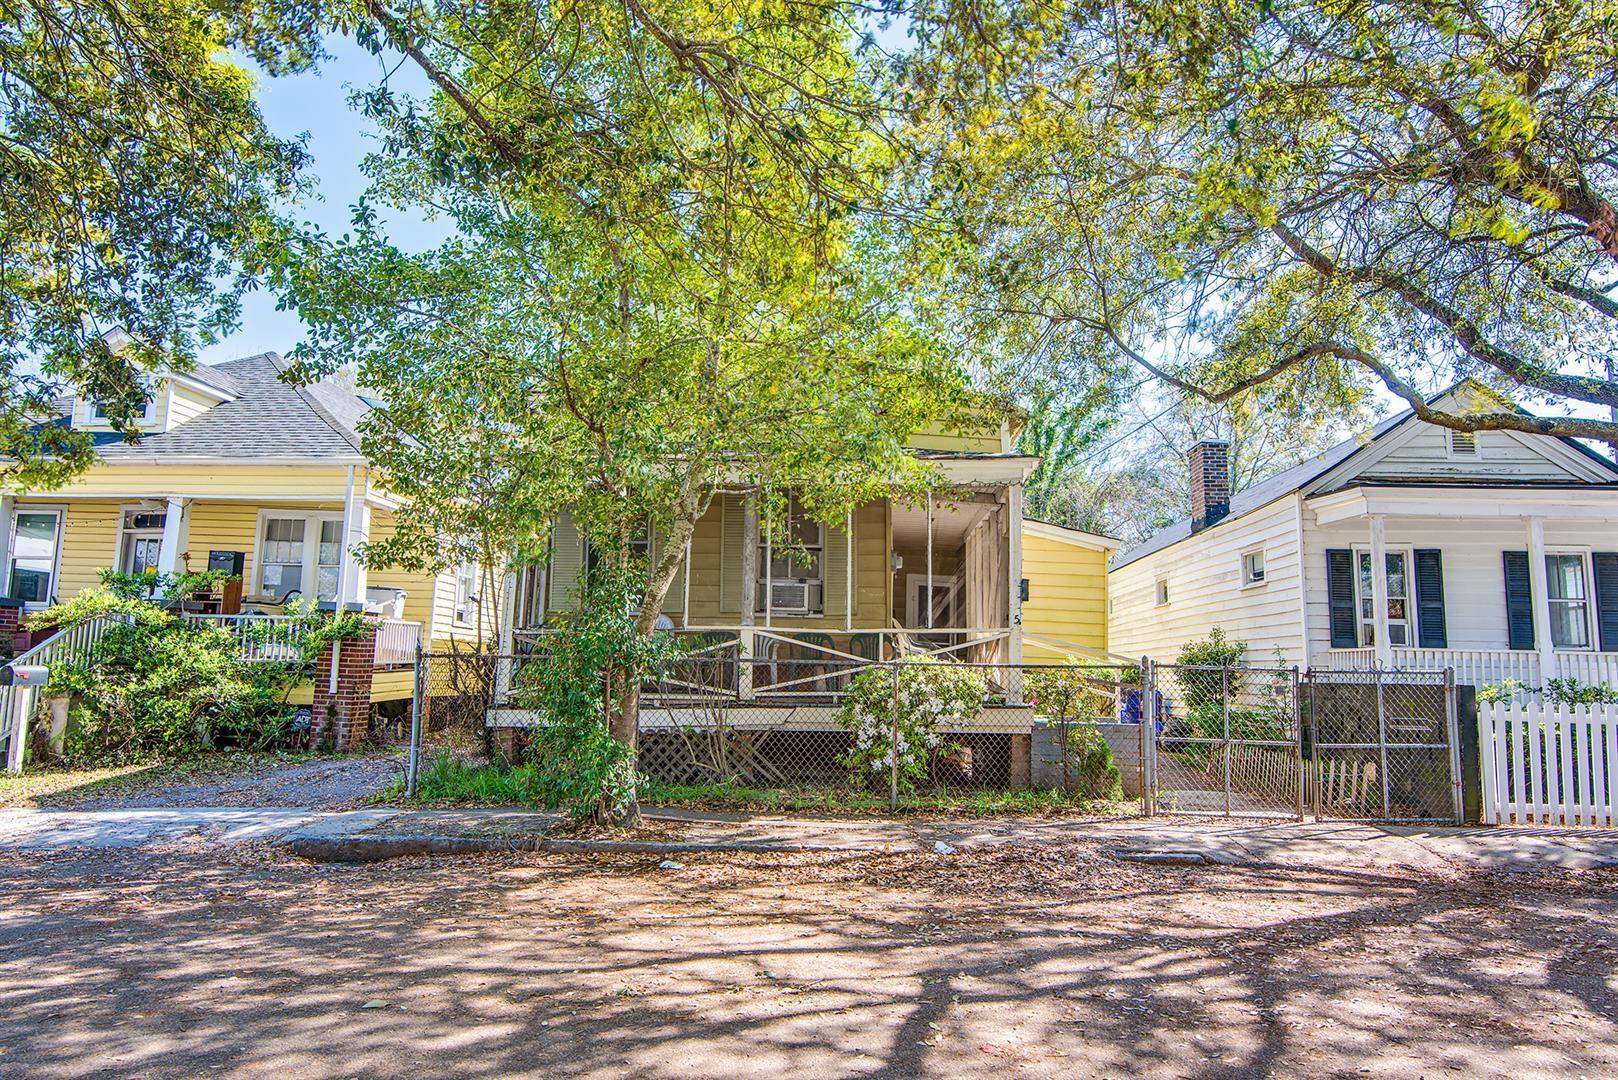 North Central Homes For Sale - 5 Addison, Charleston, SC - 0